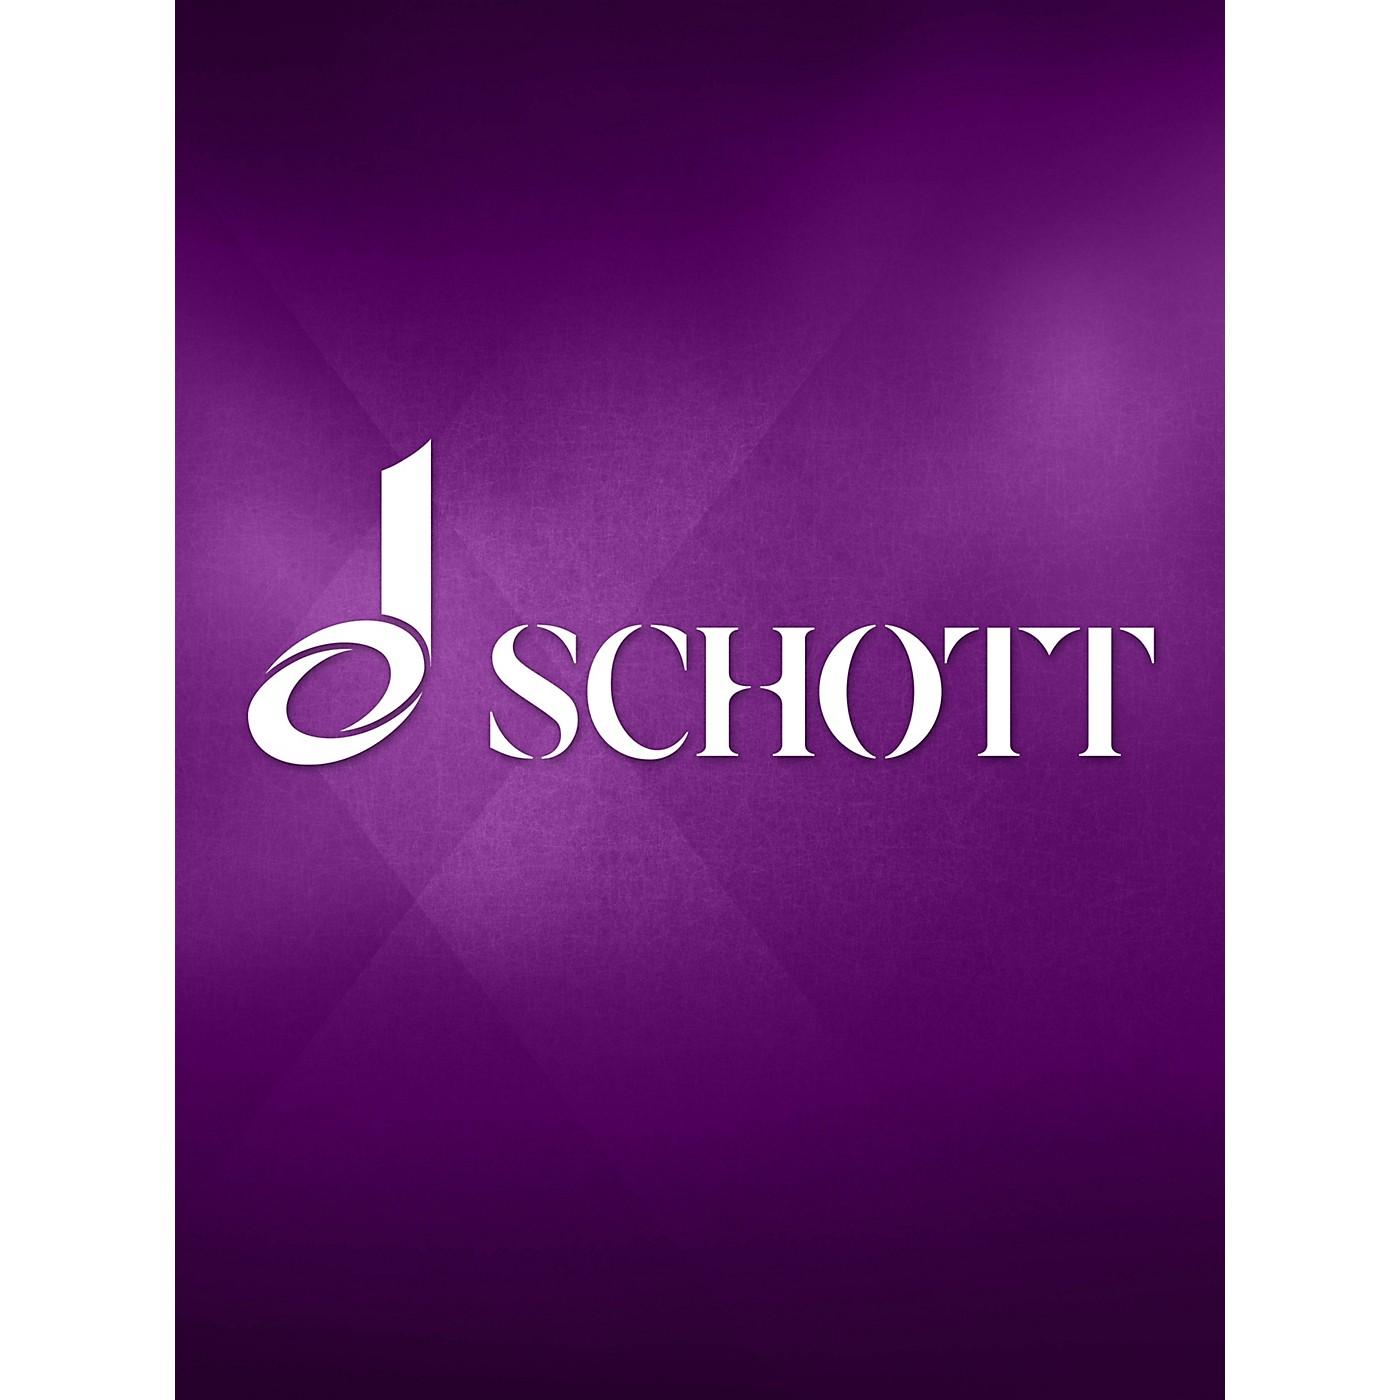 Schott Wine, Women, and Song Waltz, Op. 333 (Wein, Weib und Gesang) thumbnail